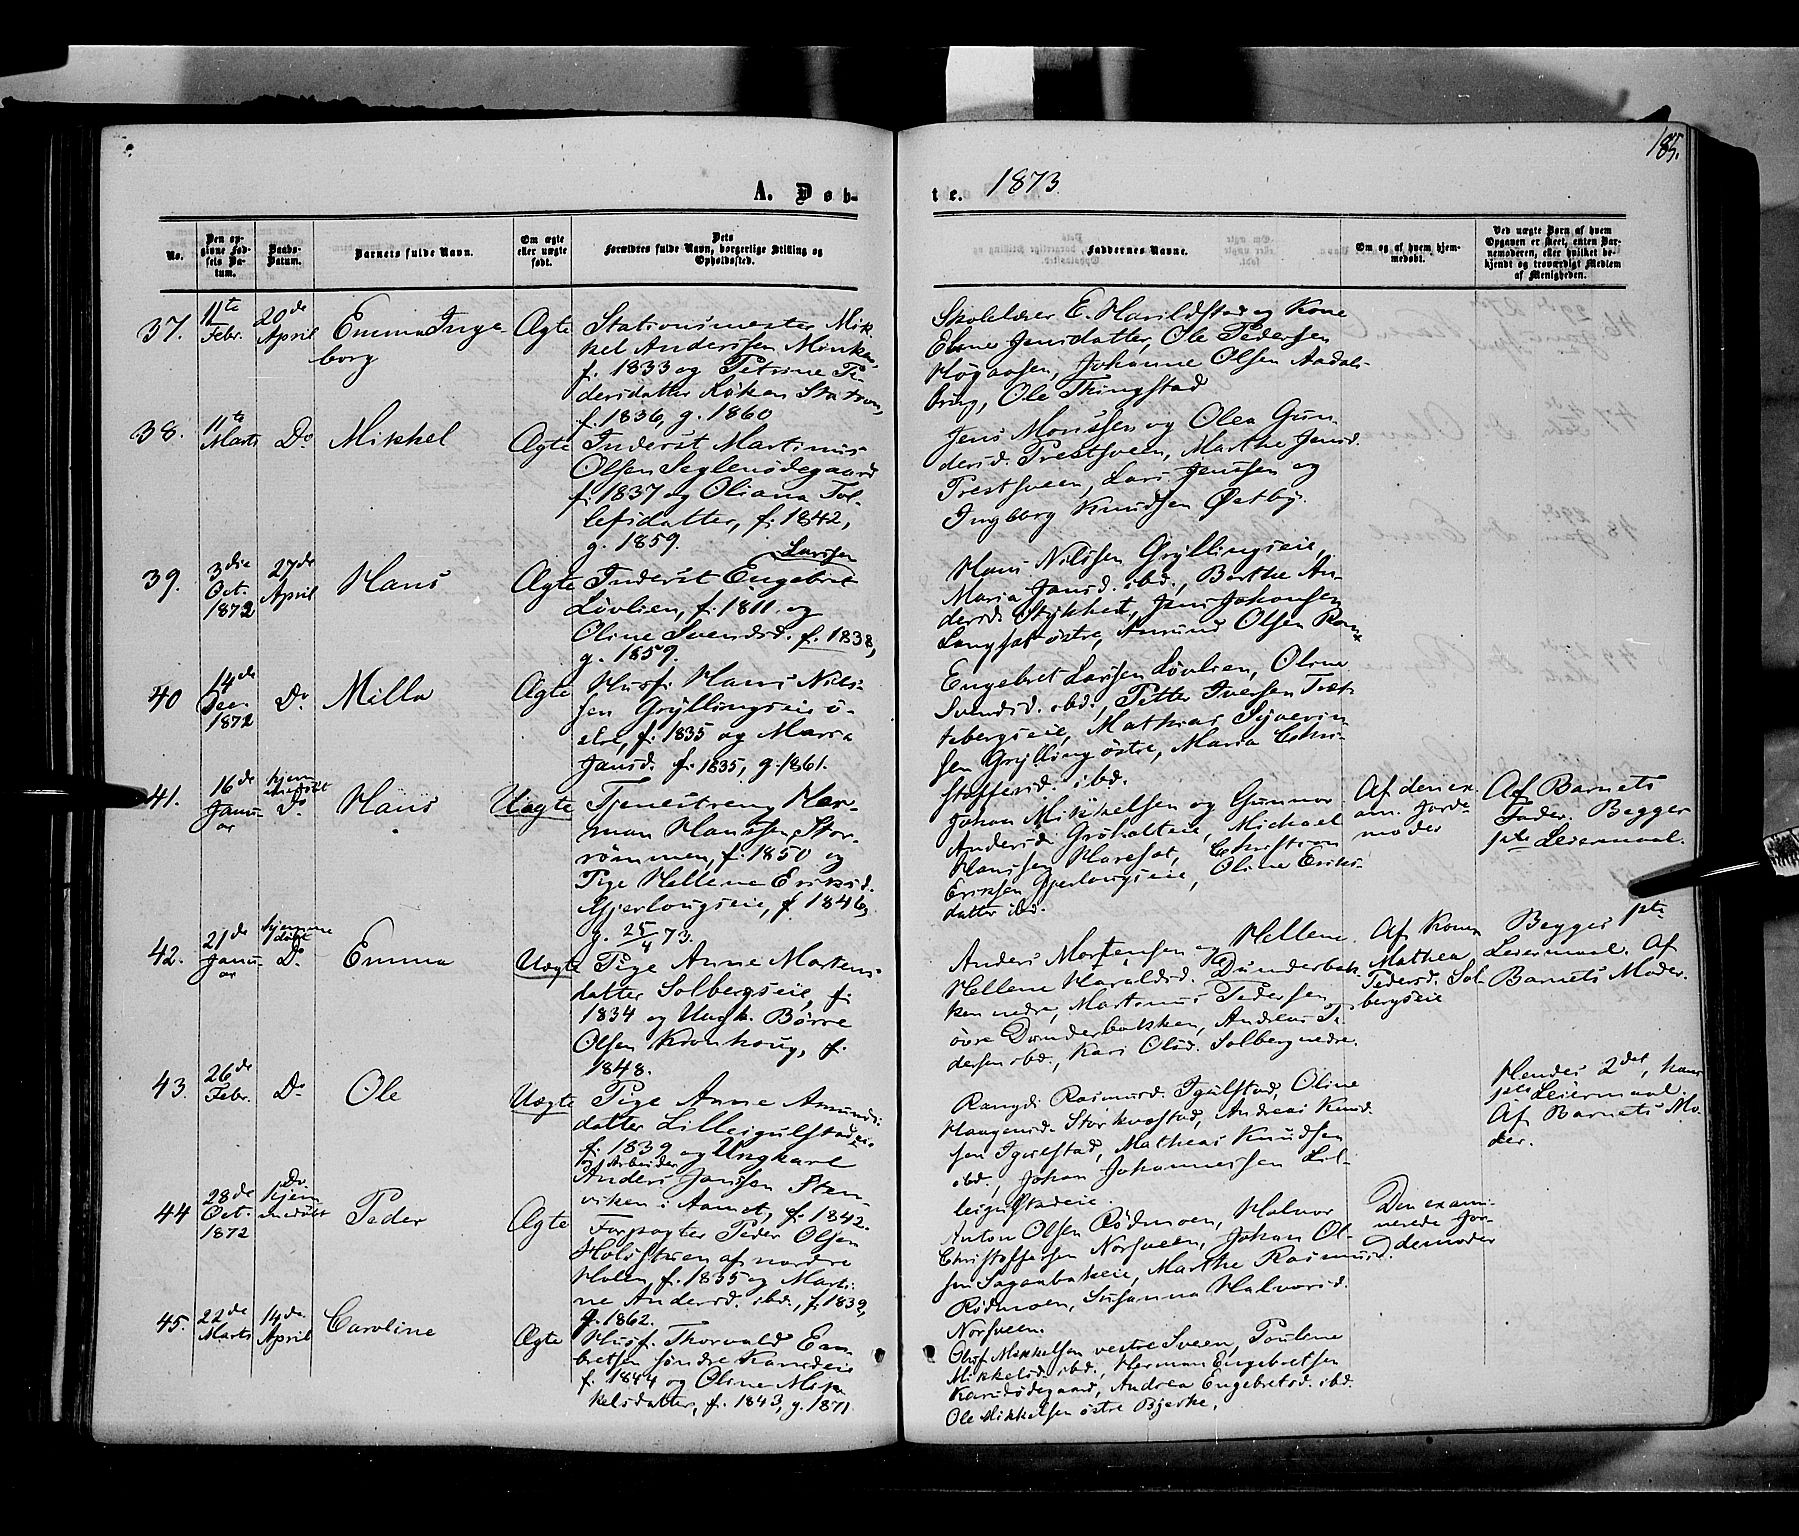 SAH, Løten prestekontor, K/Ka/L0008: Ministerialbok nr. 8, 1860-1877, s. 185